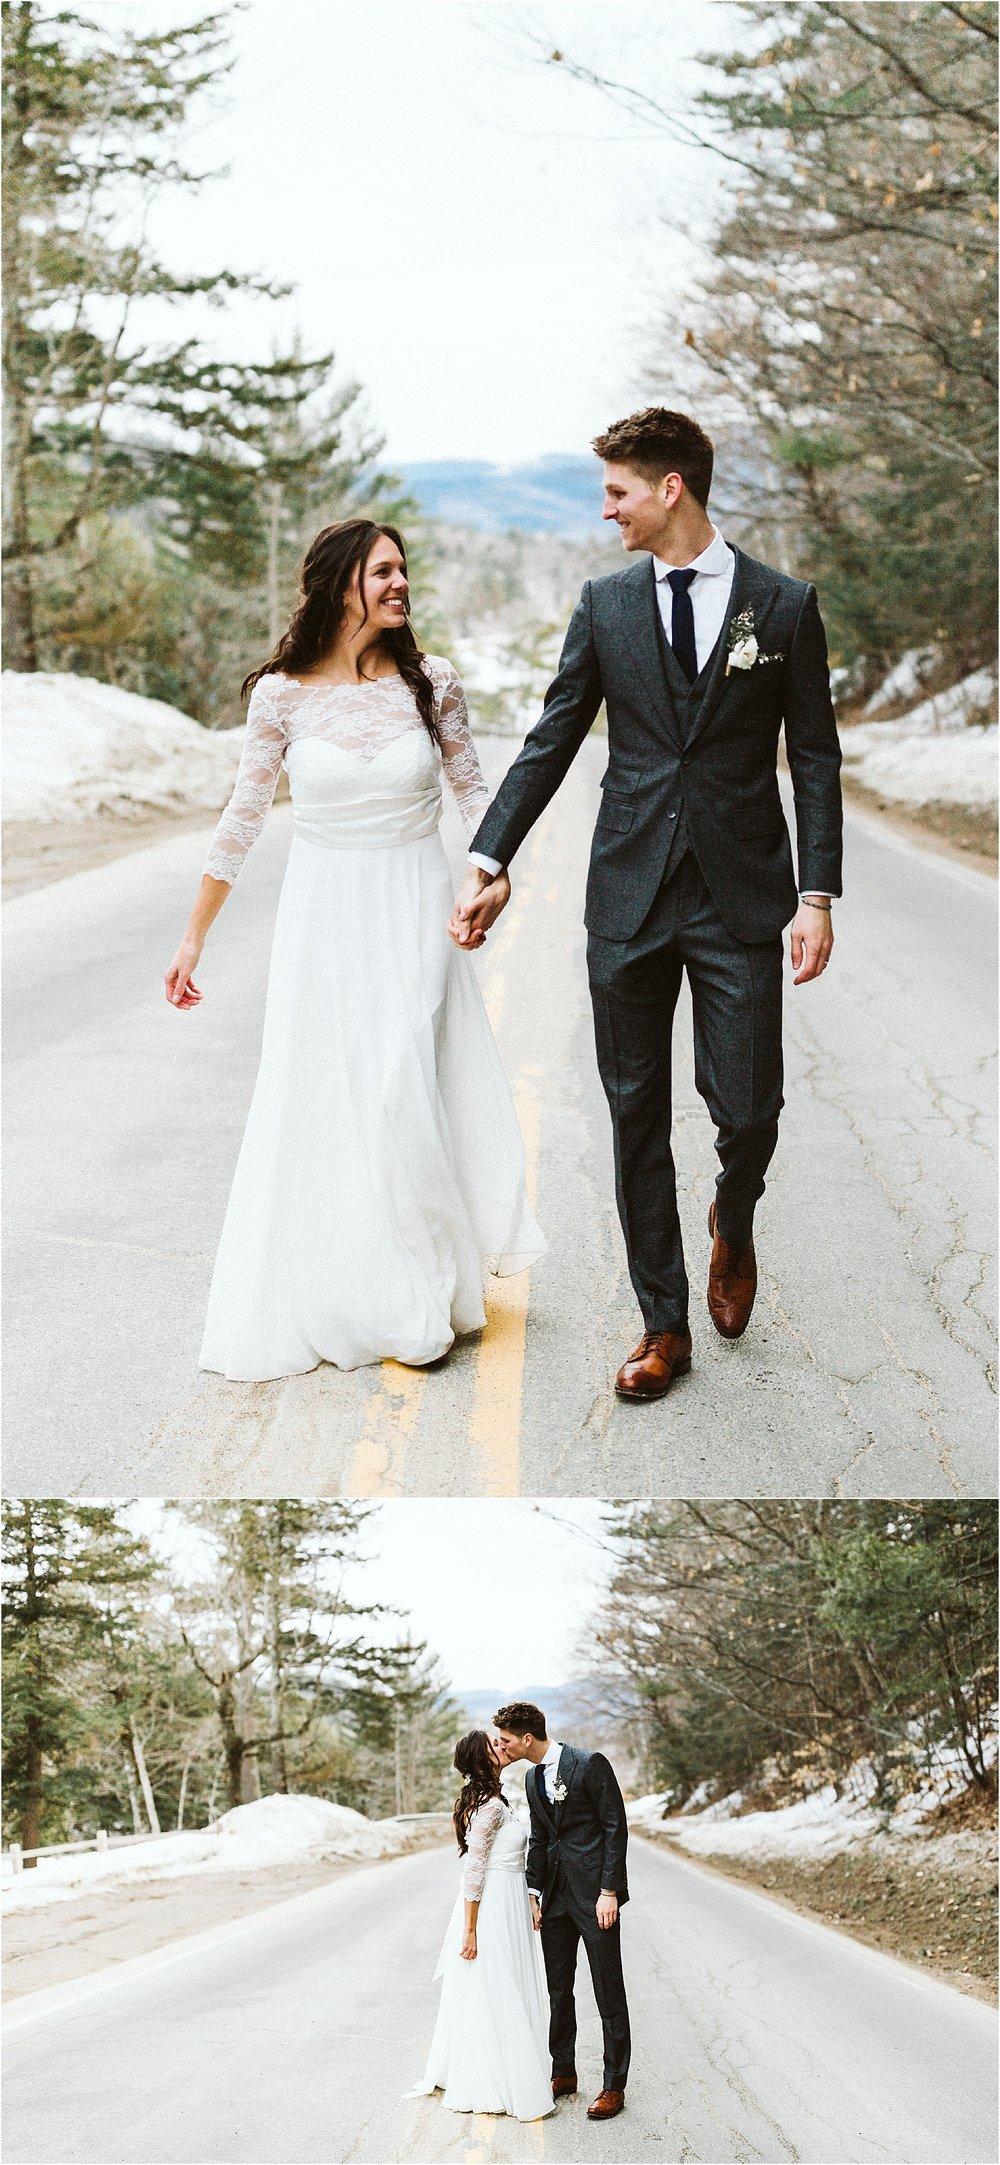 New Hampshire Winter Wedding_0081.jpg